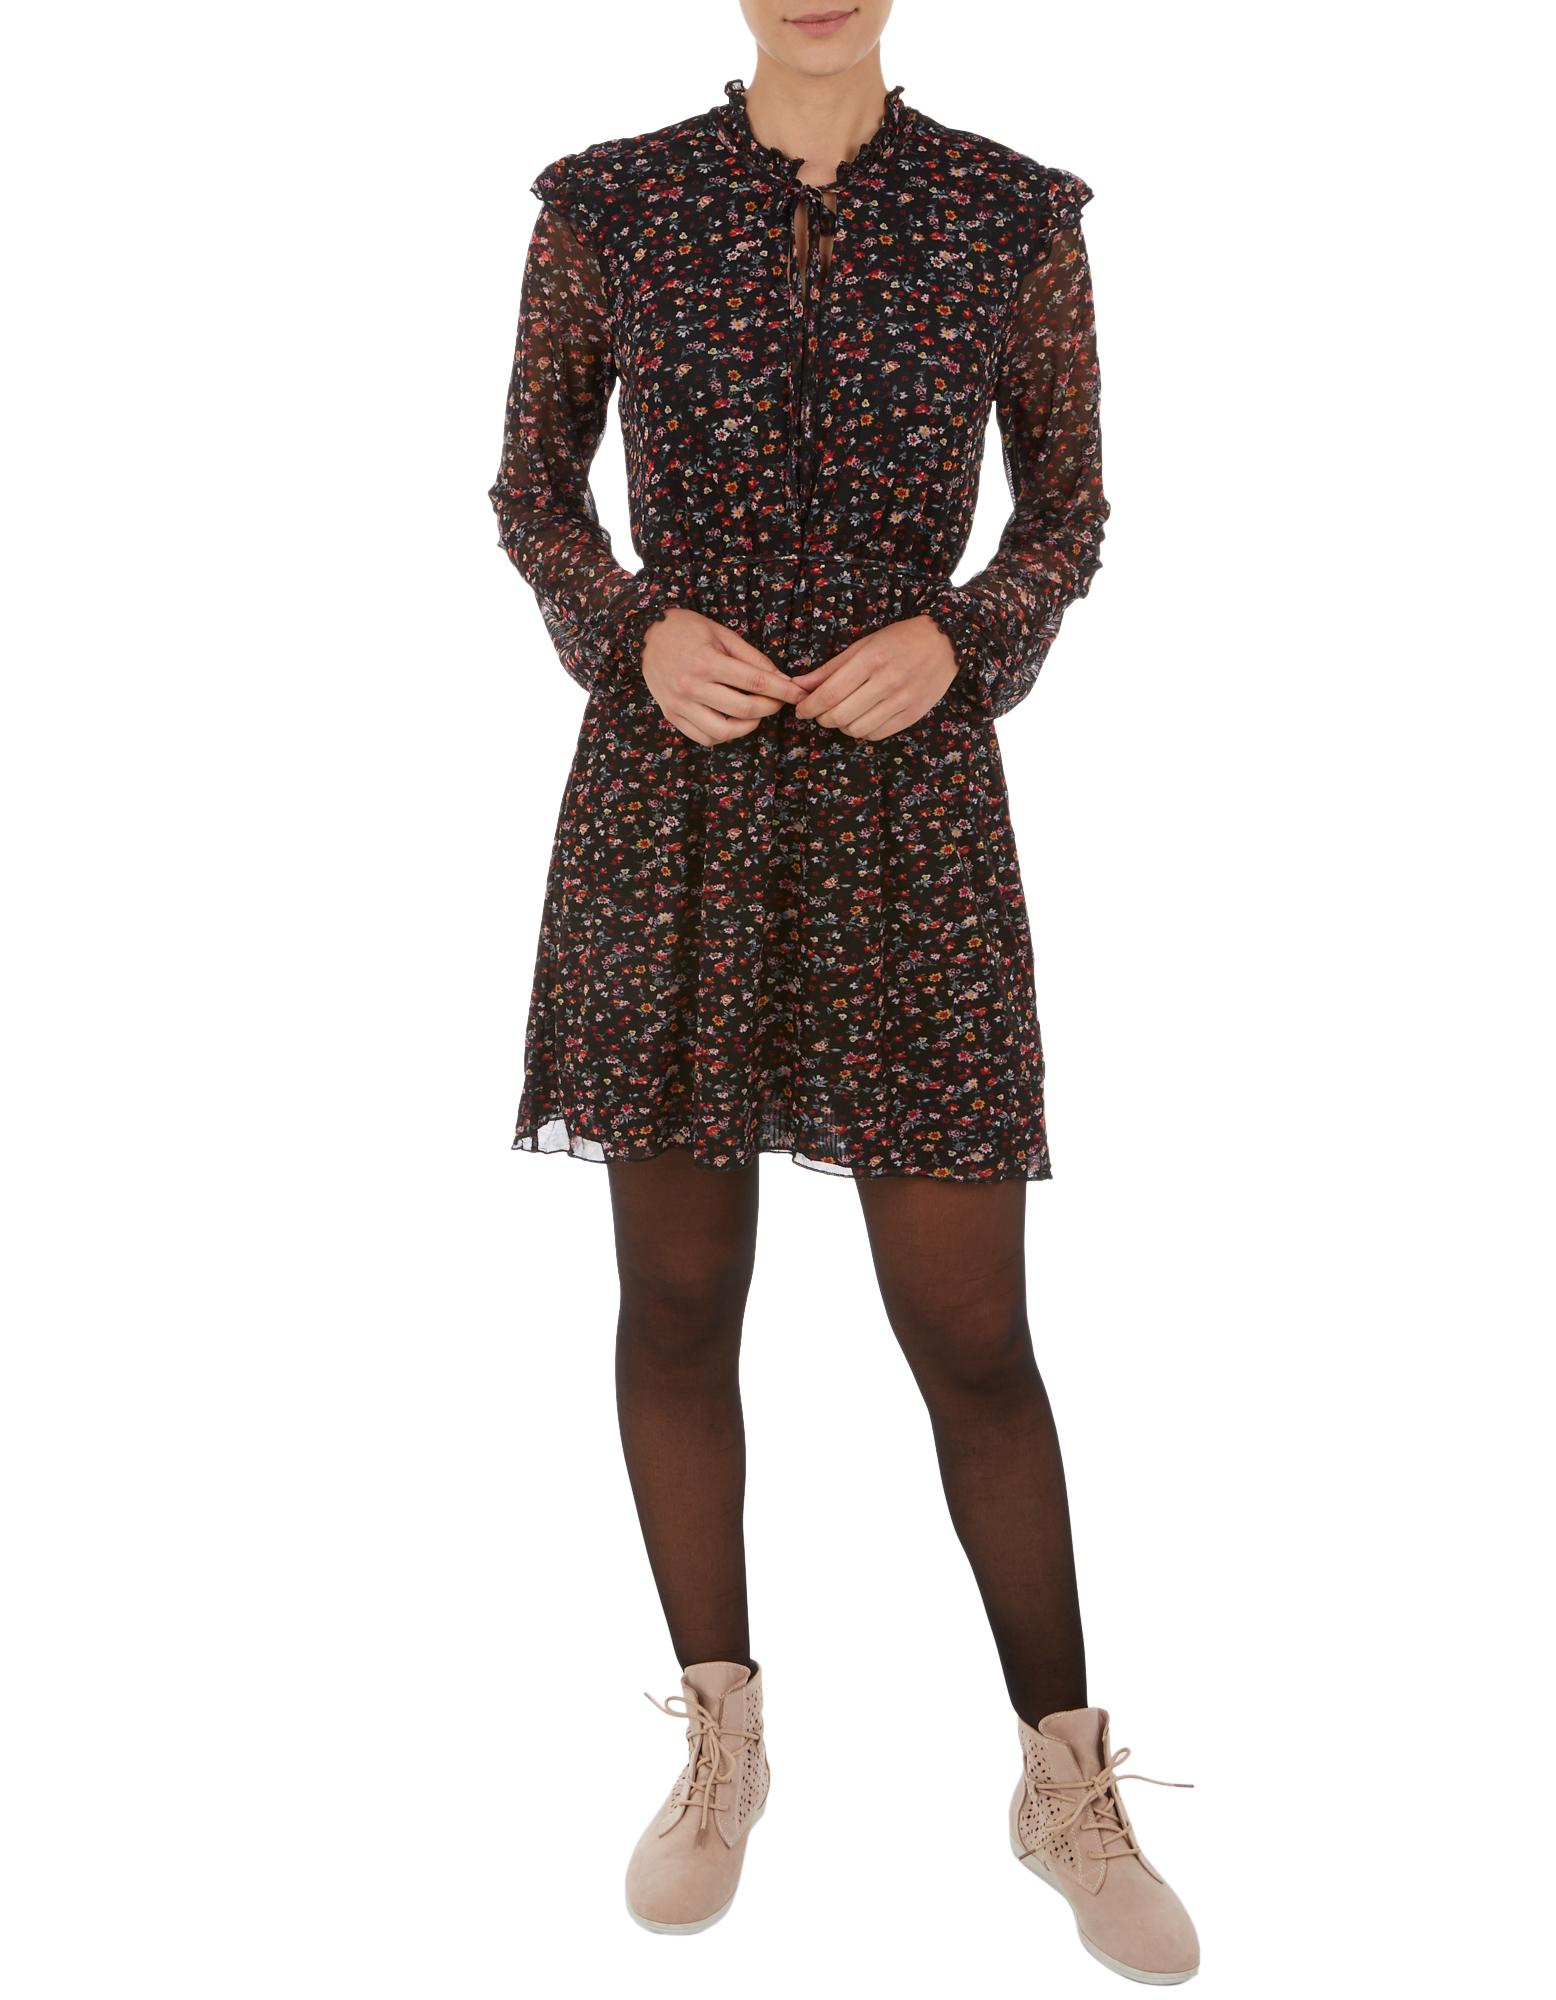 Damen Kleid mit floralem Allover-Muster  | 81546731800403